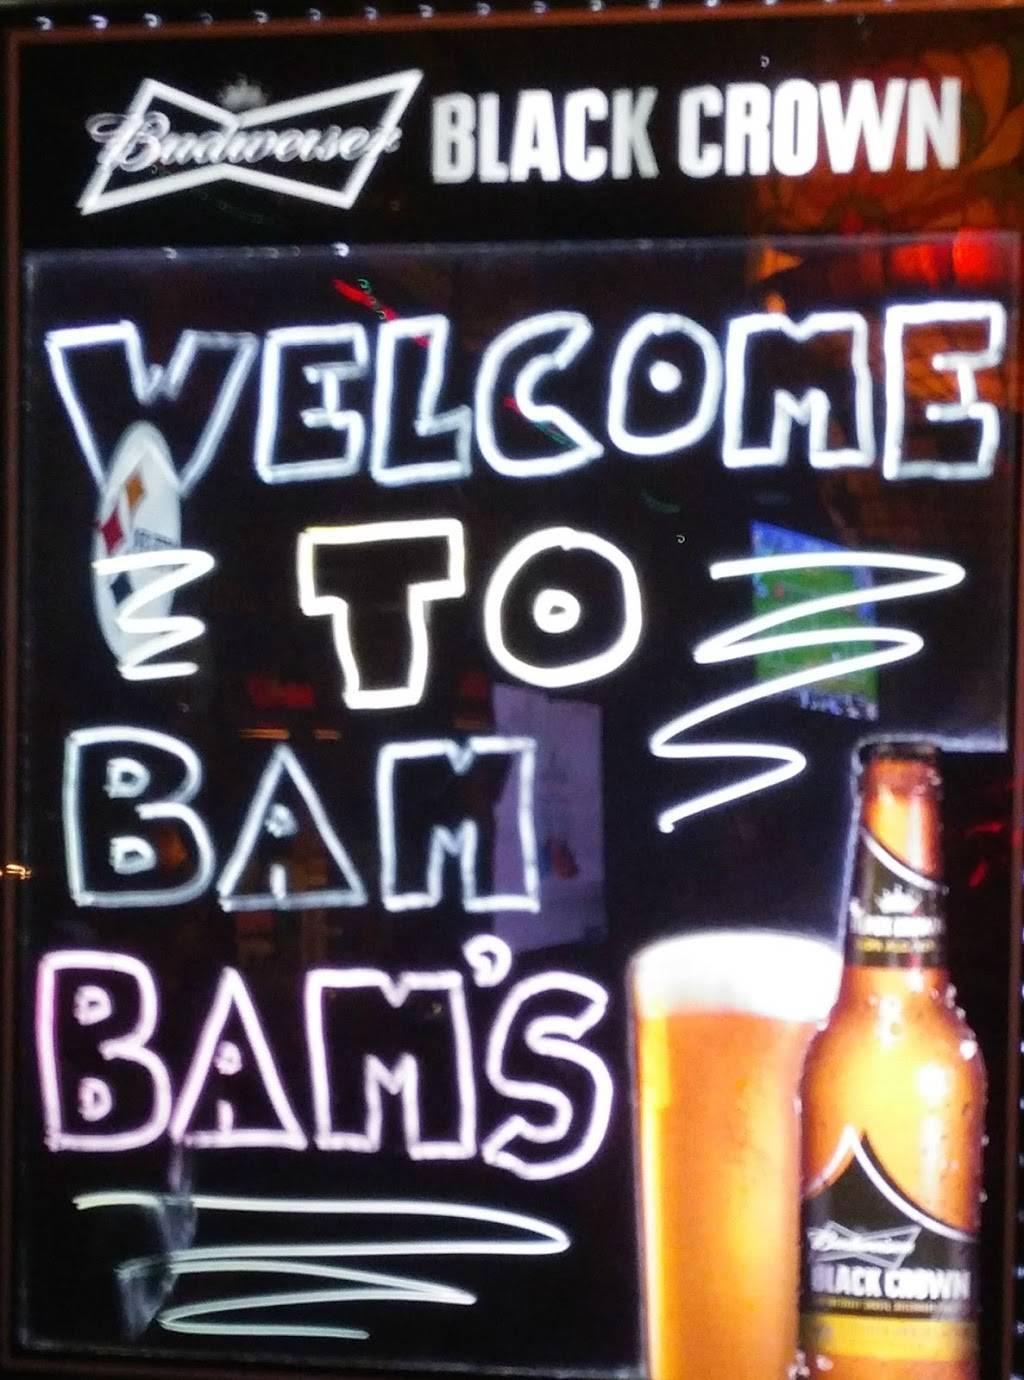 Bam Bams Bar & Grill   restaurant   725 E International Speedway Blvd, Daytona Beach, FL 32118, USA   3862813160 OR +1 386-281-3160